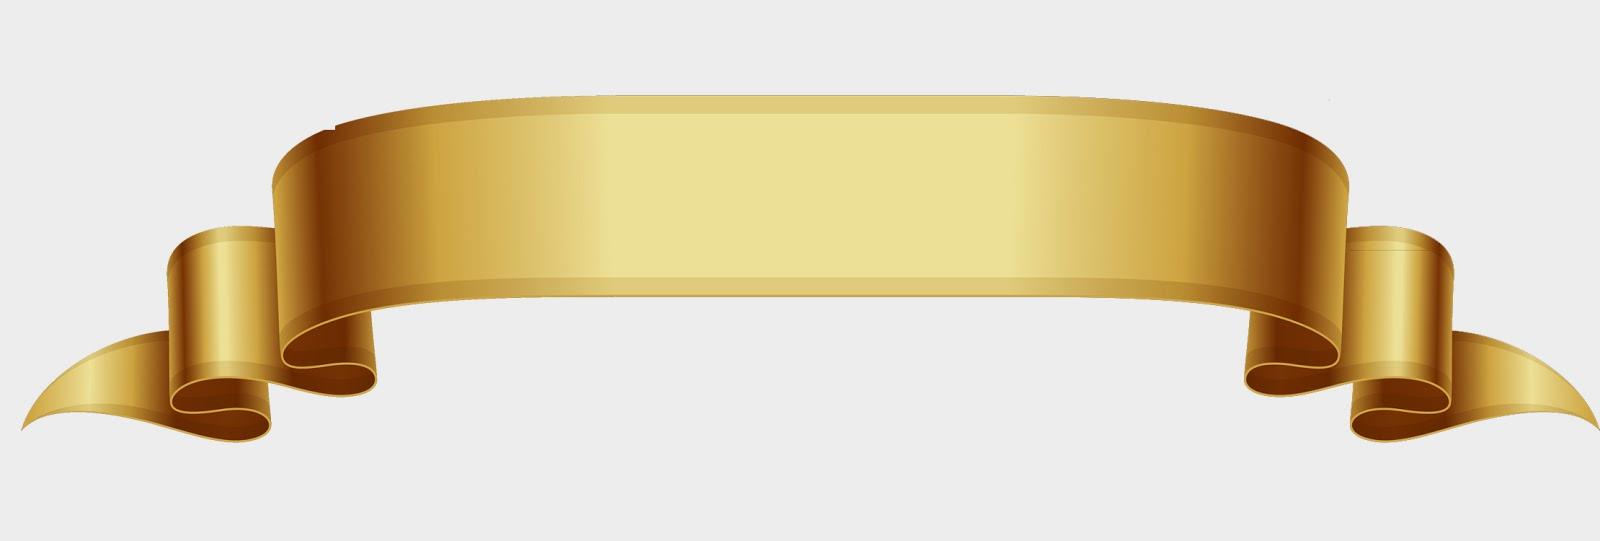 Image Gold Ribbon Banner Vector Download